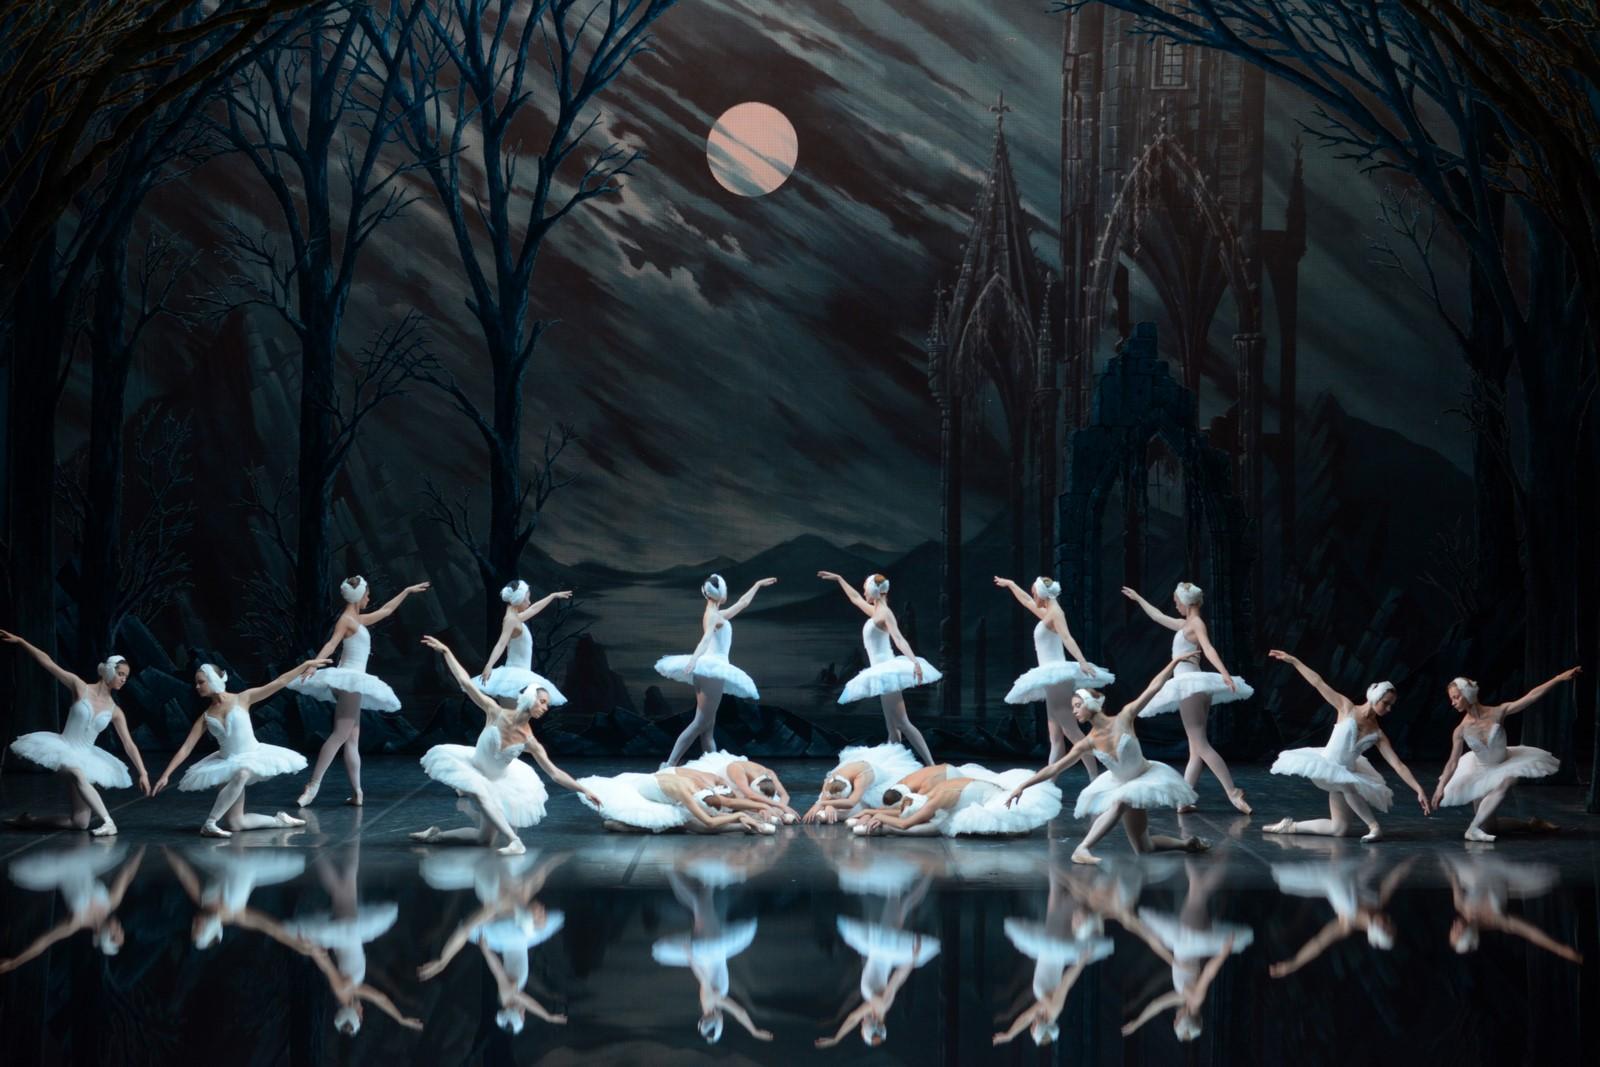 Anmeldelse: Svanesøen, Det Ny Teater (St. Petersburg Ballet Theatre)